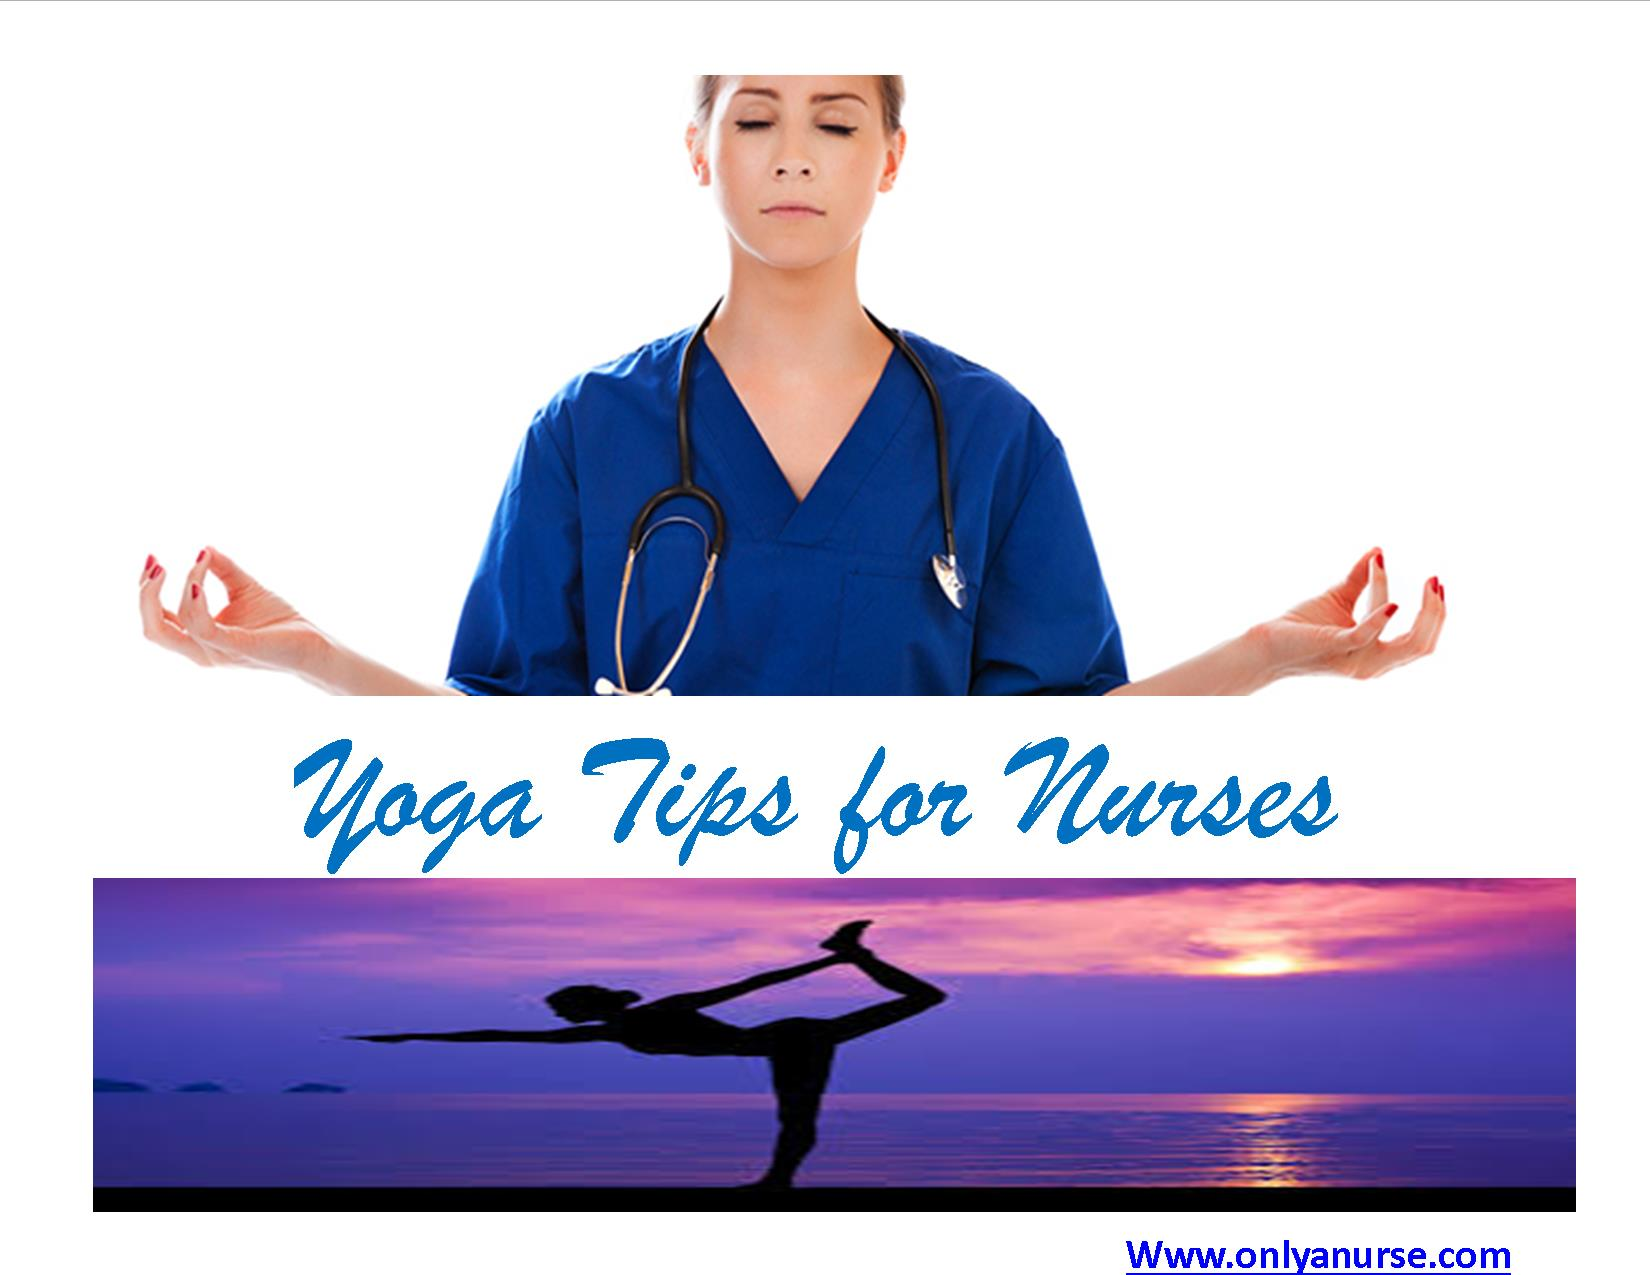 Yoga for nurses, nurses and yoga, yoga tips for nurses